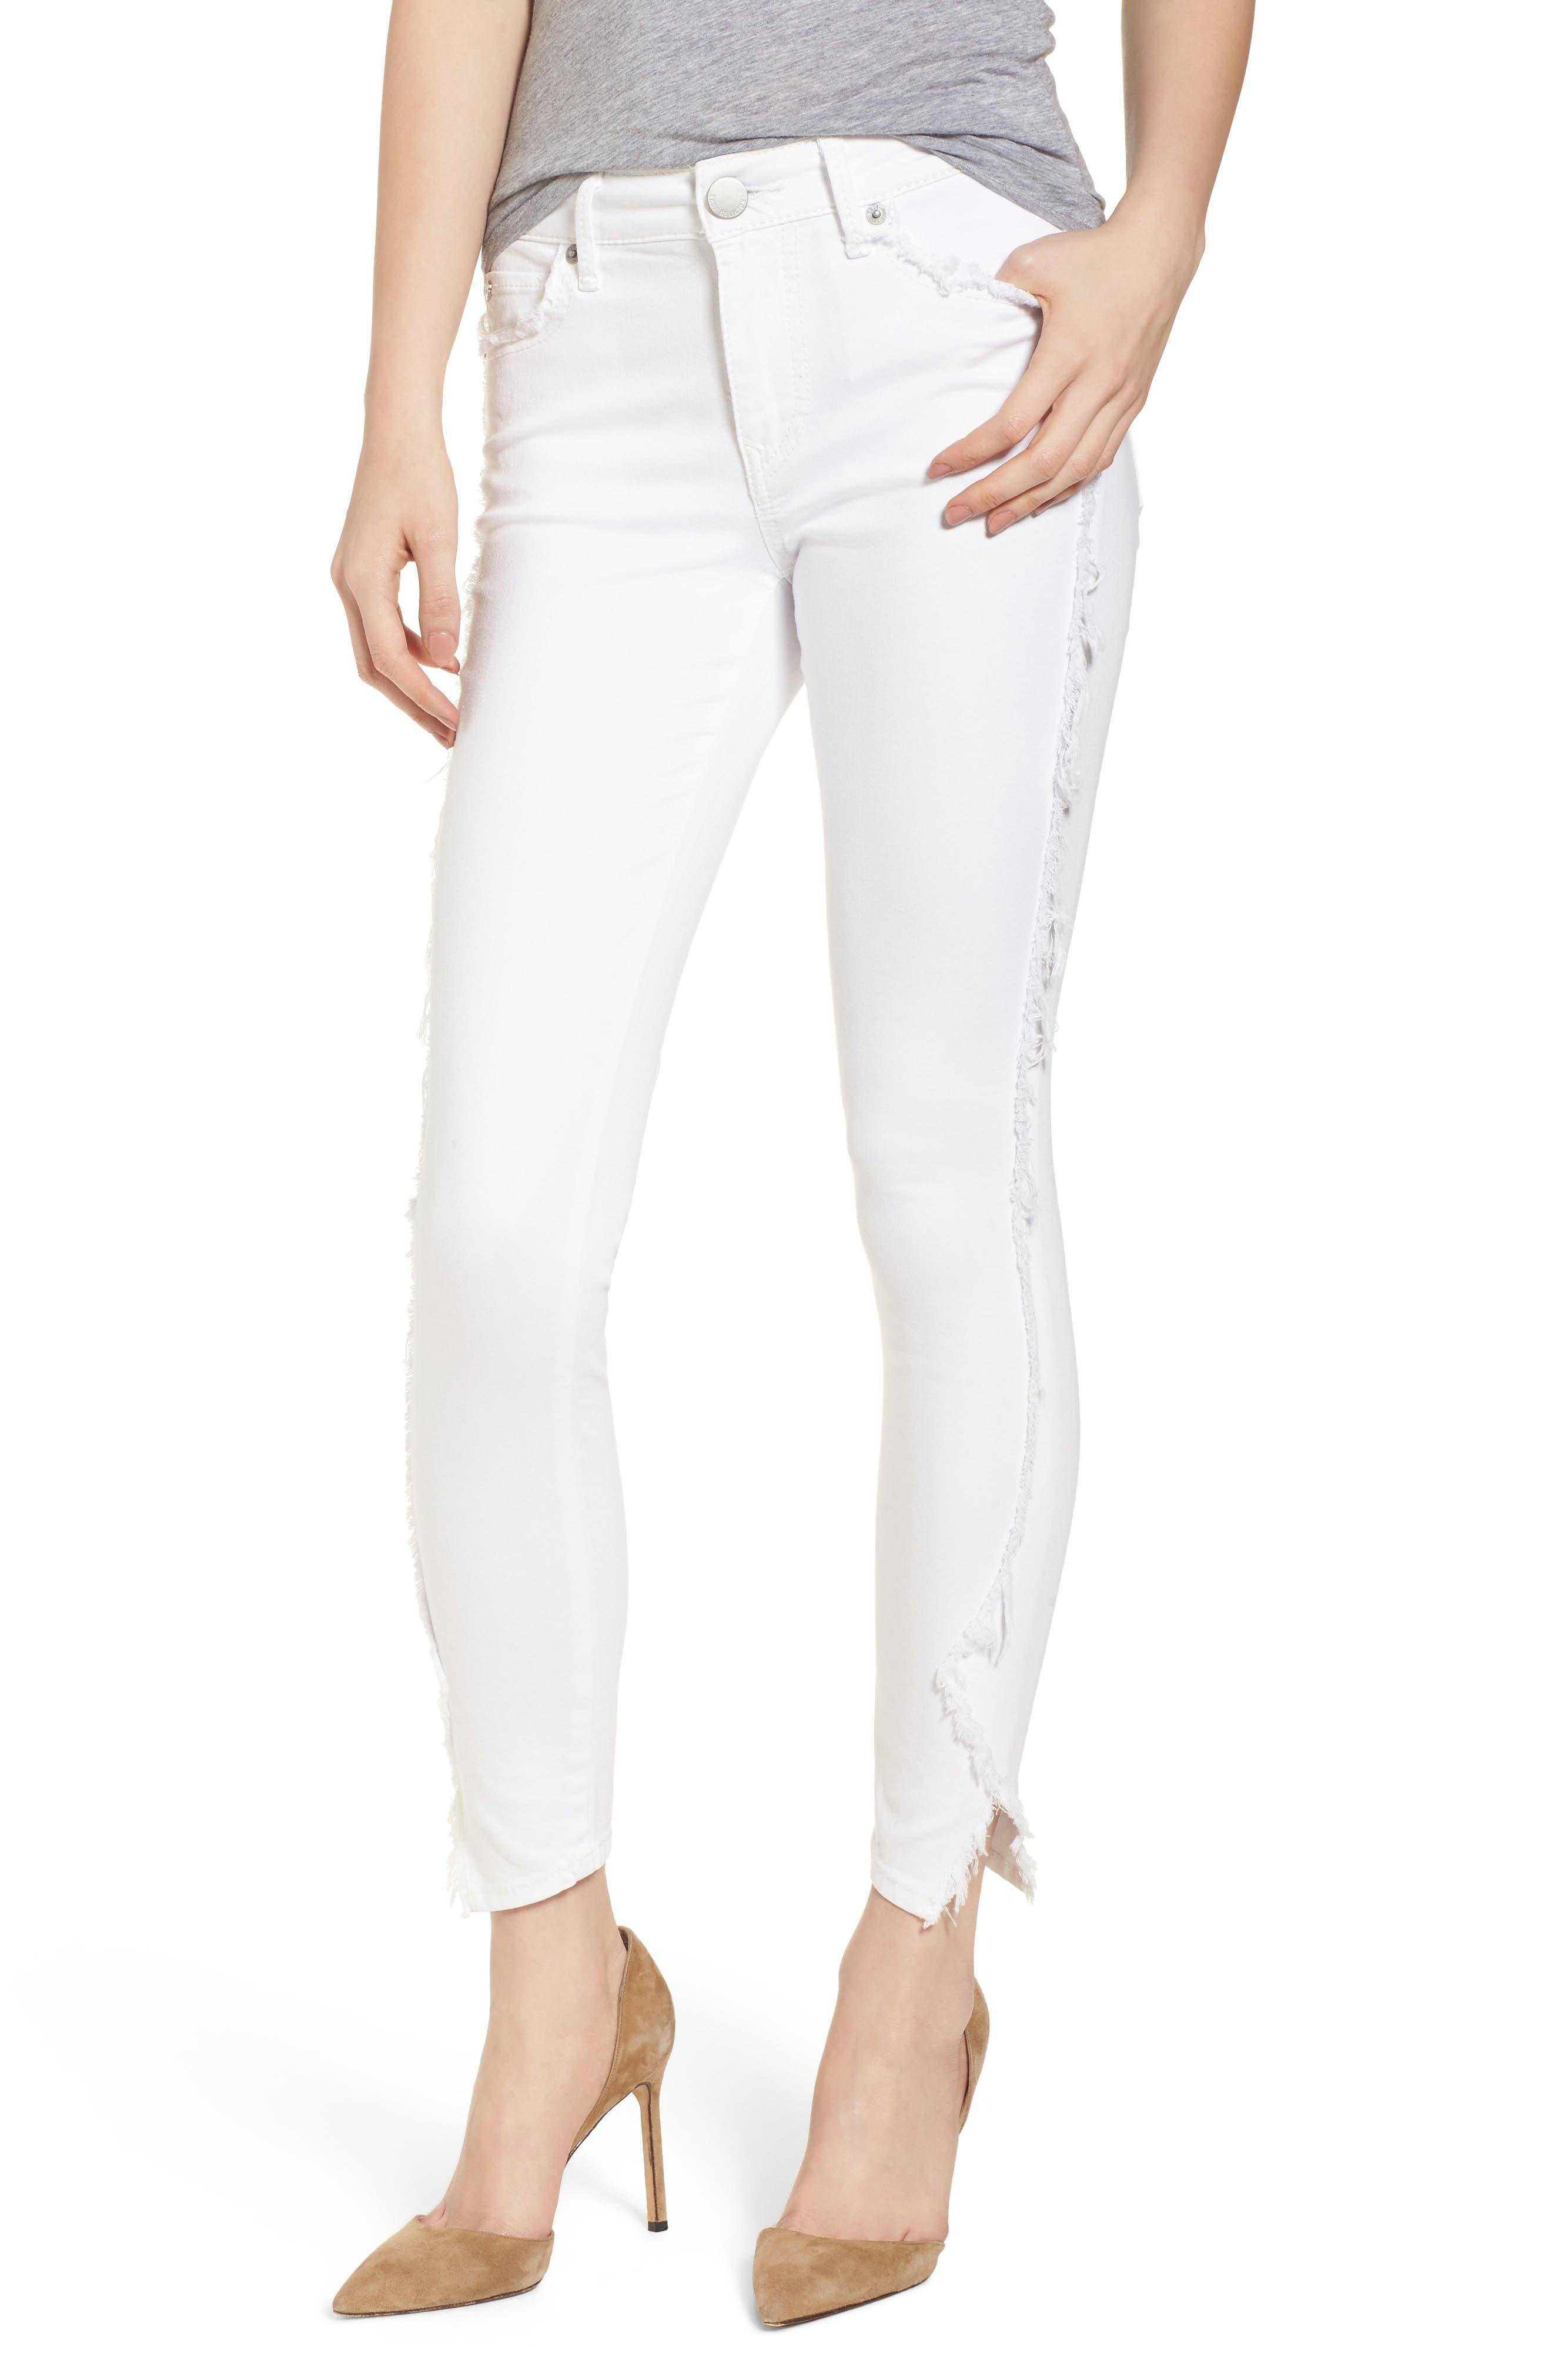 Jennie Curvy Skinny Jeans,                             Main thumbnail 1, color,                             Optic White